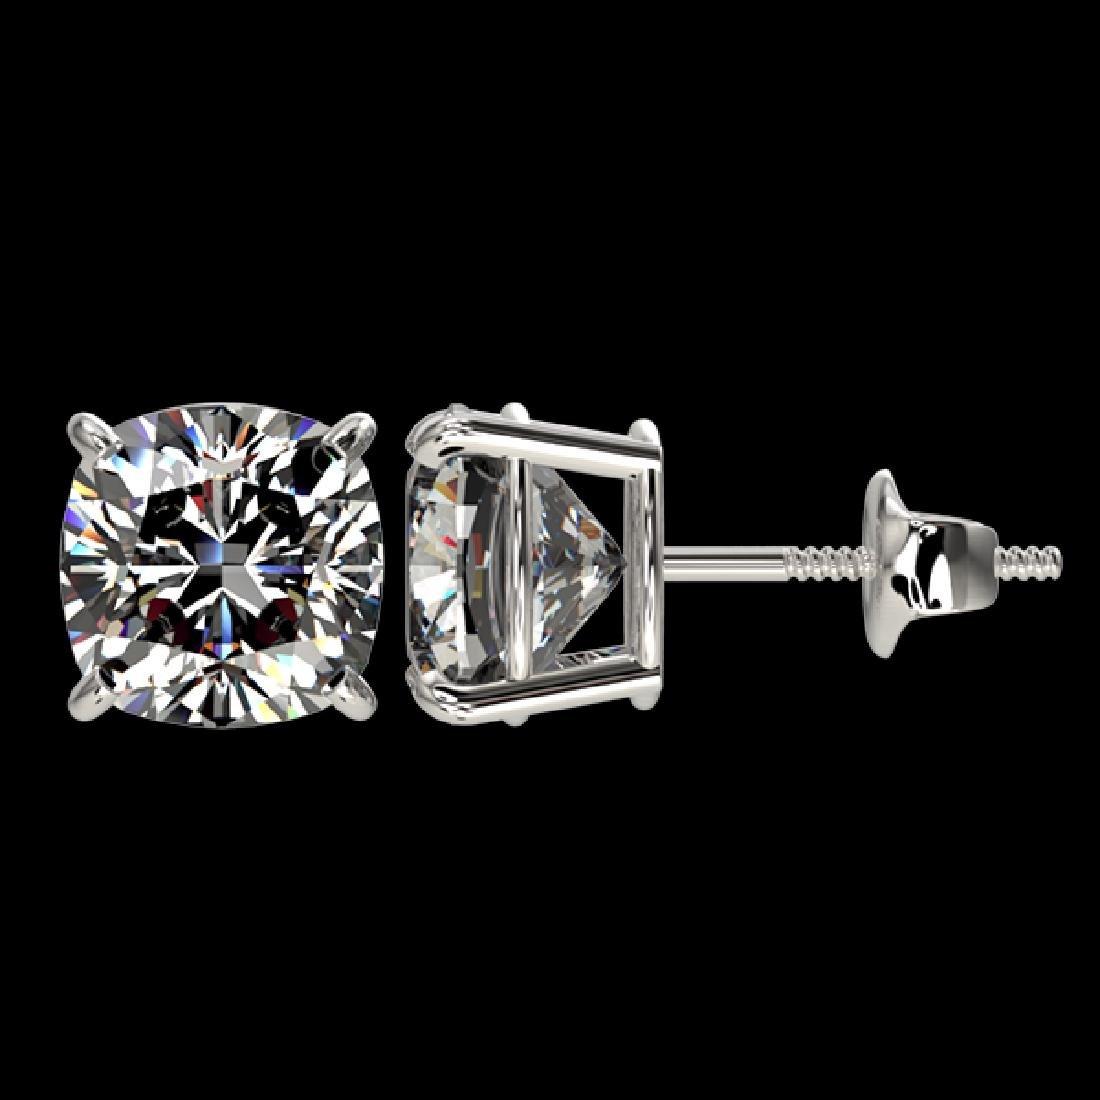 2.50 CTW Certified VS/SI Quality Cushion Cut Diamond - 2